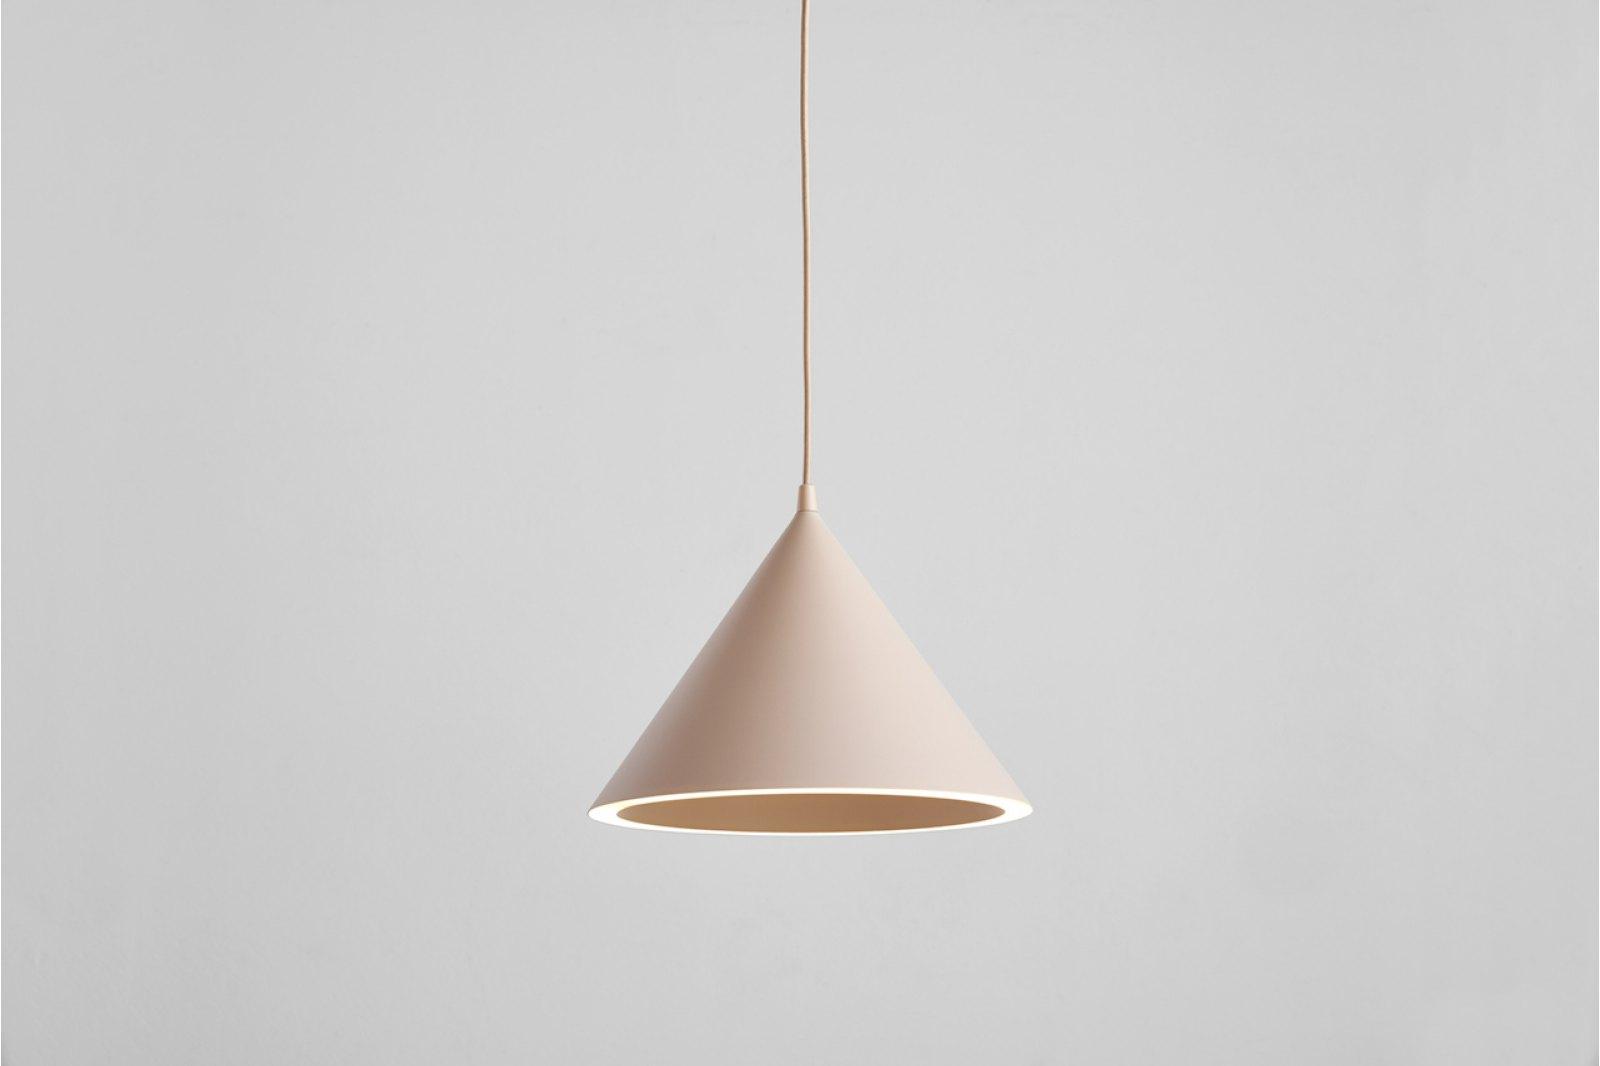 Annular LED Pendant, D32 cm / 1